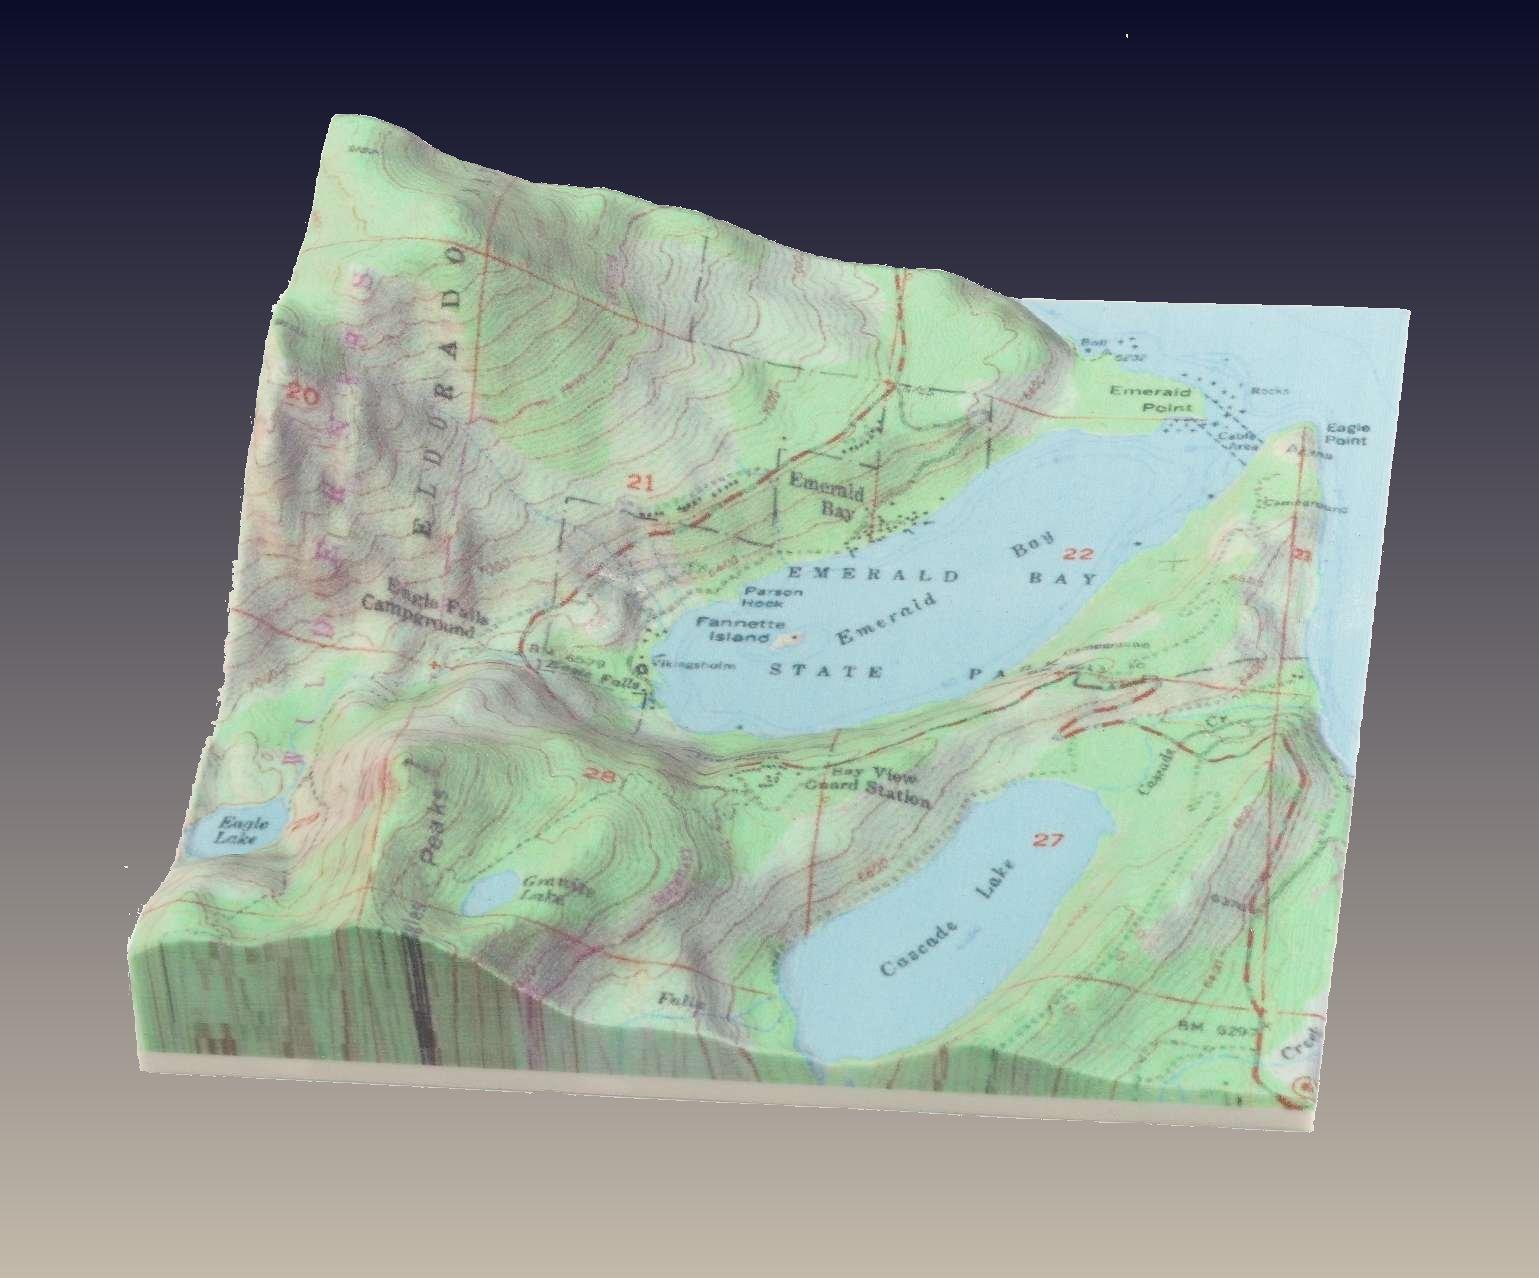 Topo Map Image